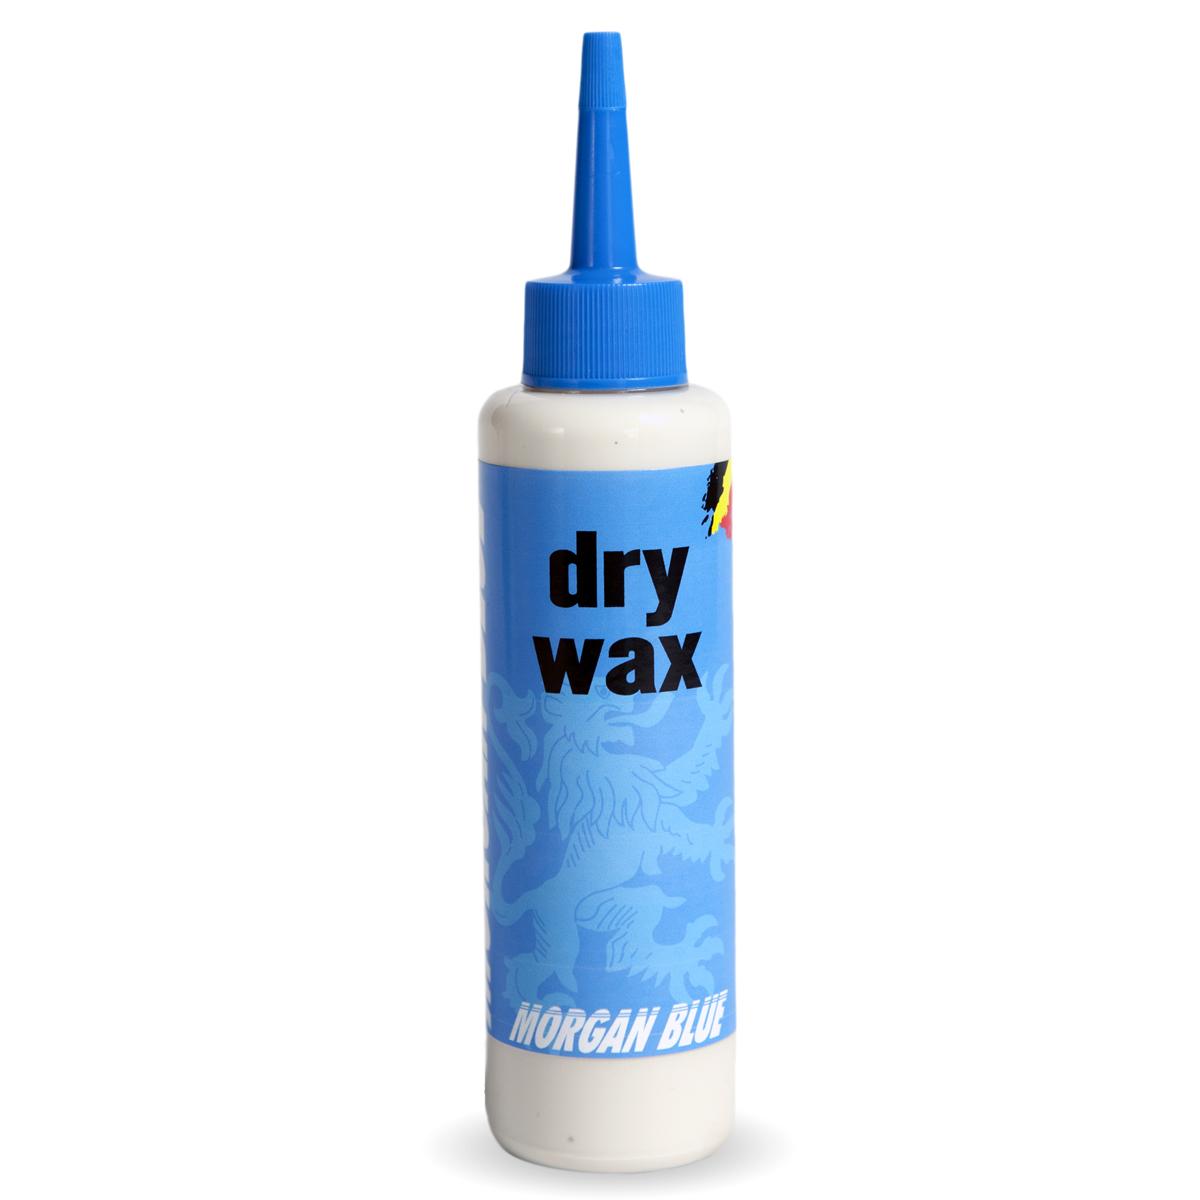 morgan blue dry wax